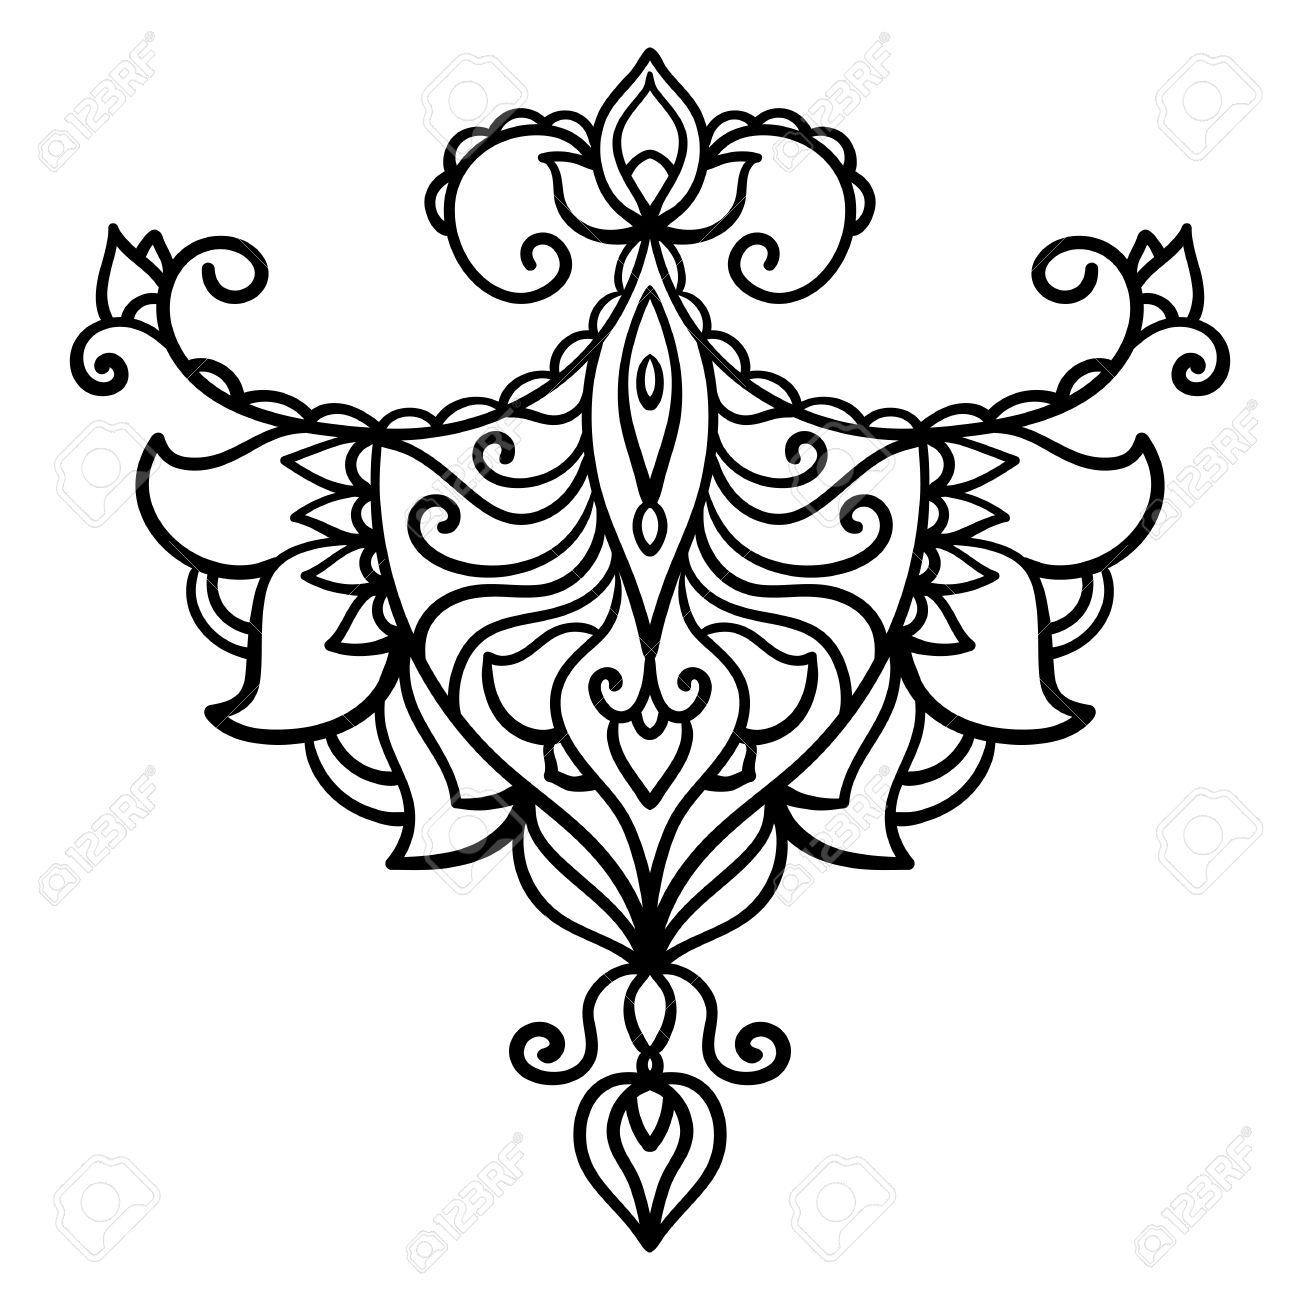 Estilo Oriental Extracto Flor Loto Tatuaje Elemento De Diseño